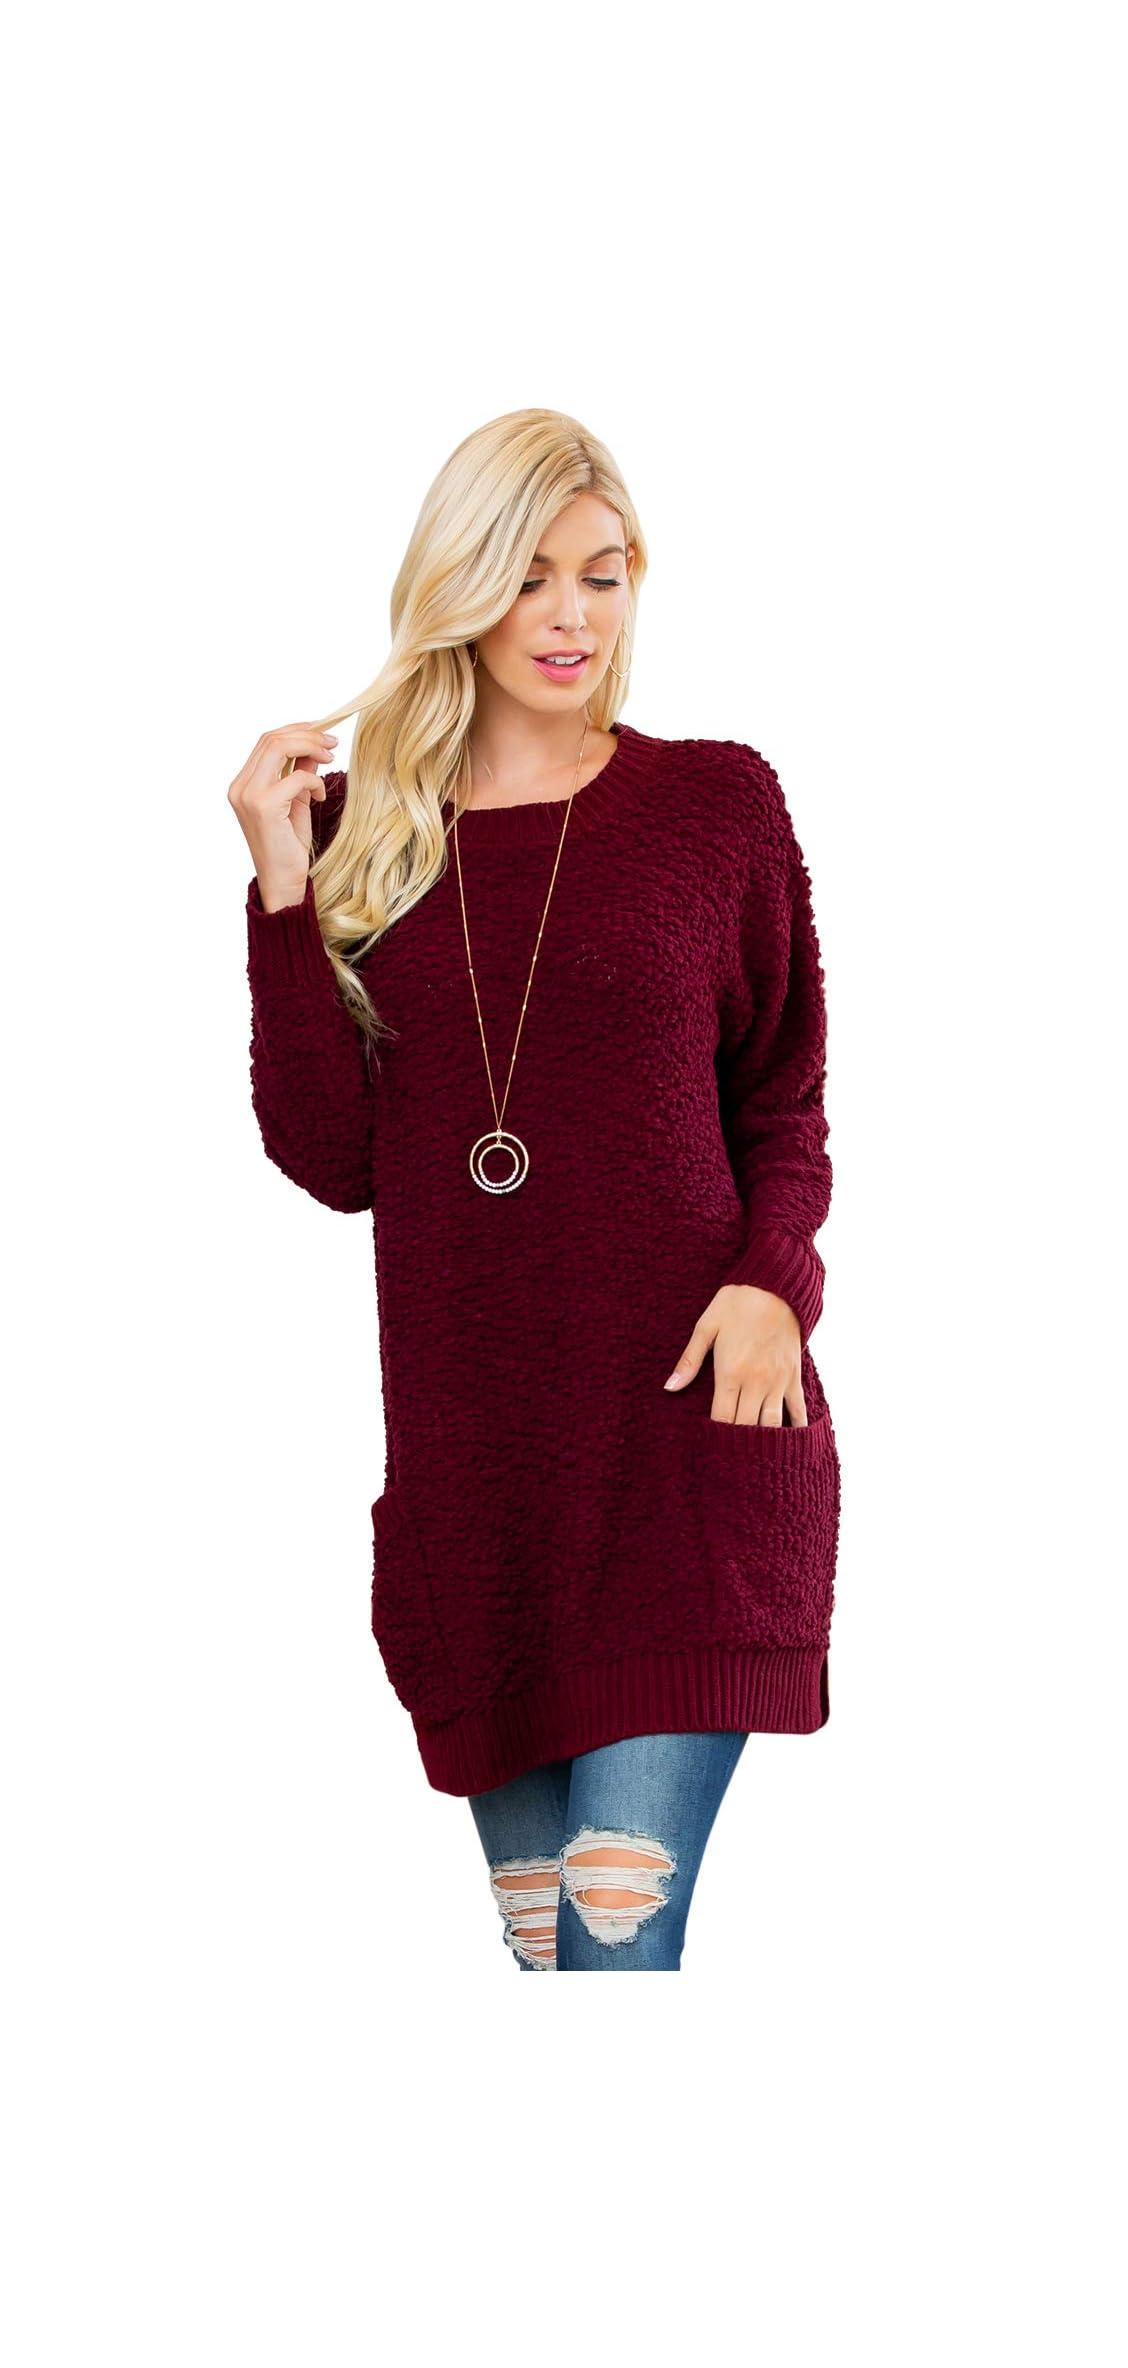 Boho Long Sleeve Soft Warm Chunky Popcorn Sweater - Cozy Casual